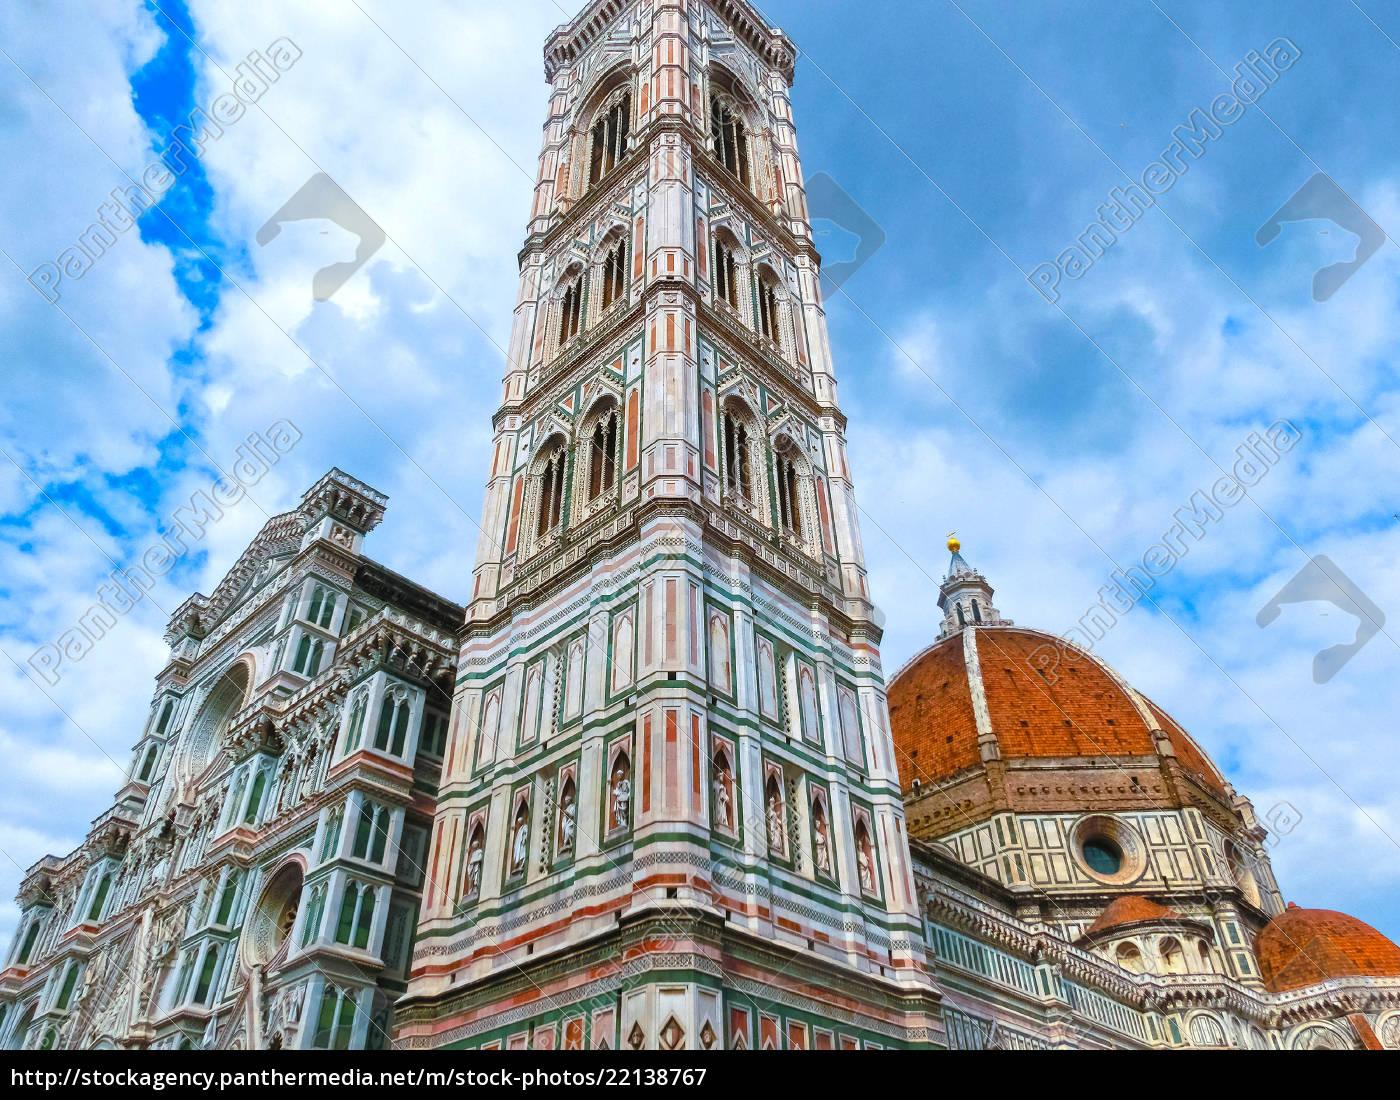 basilica, of, santa, maria, del, fiore - 22138767